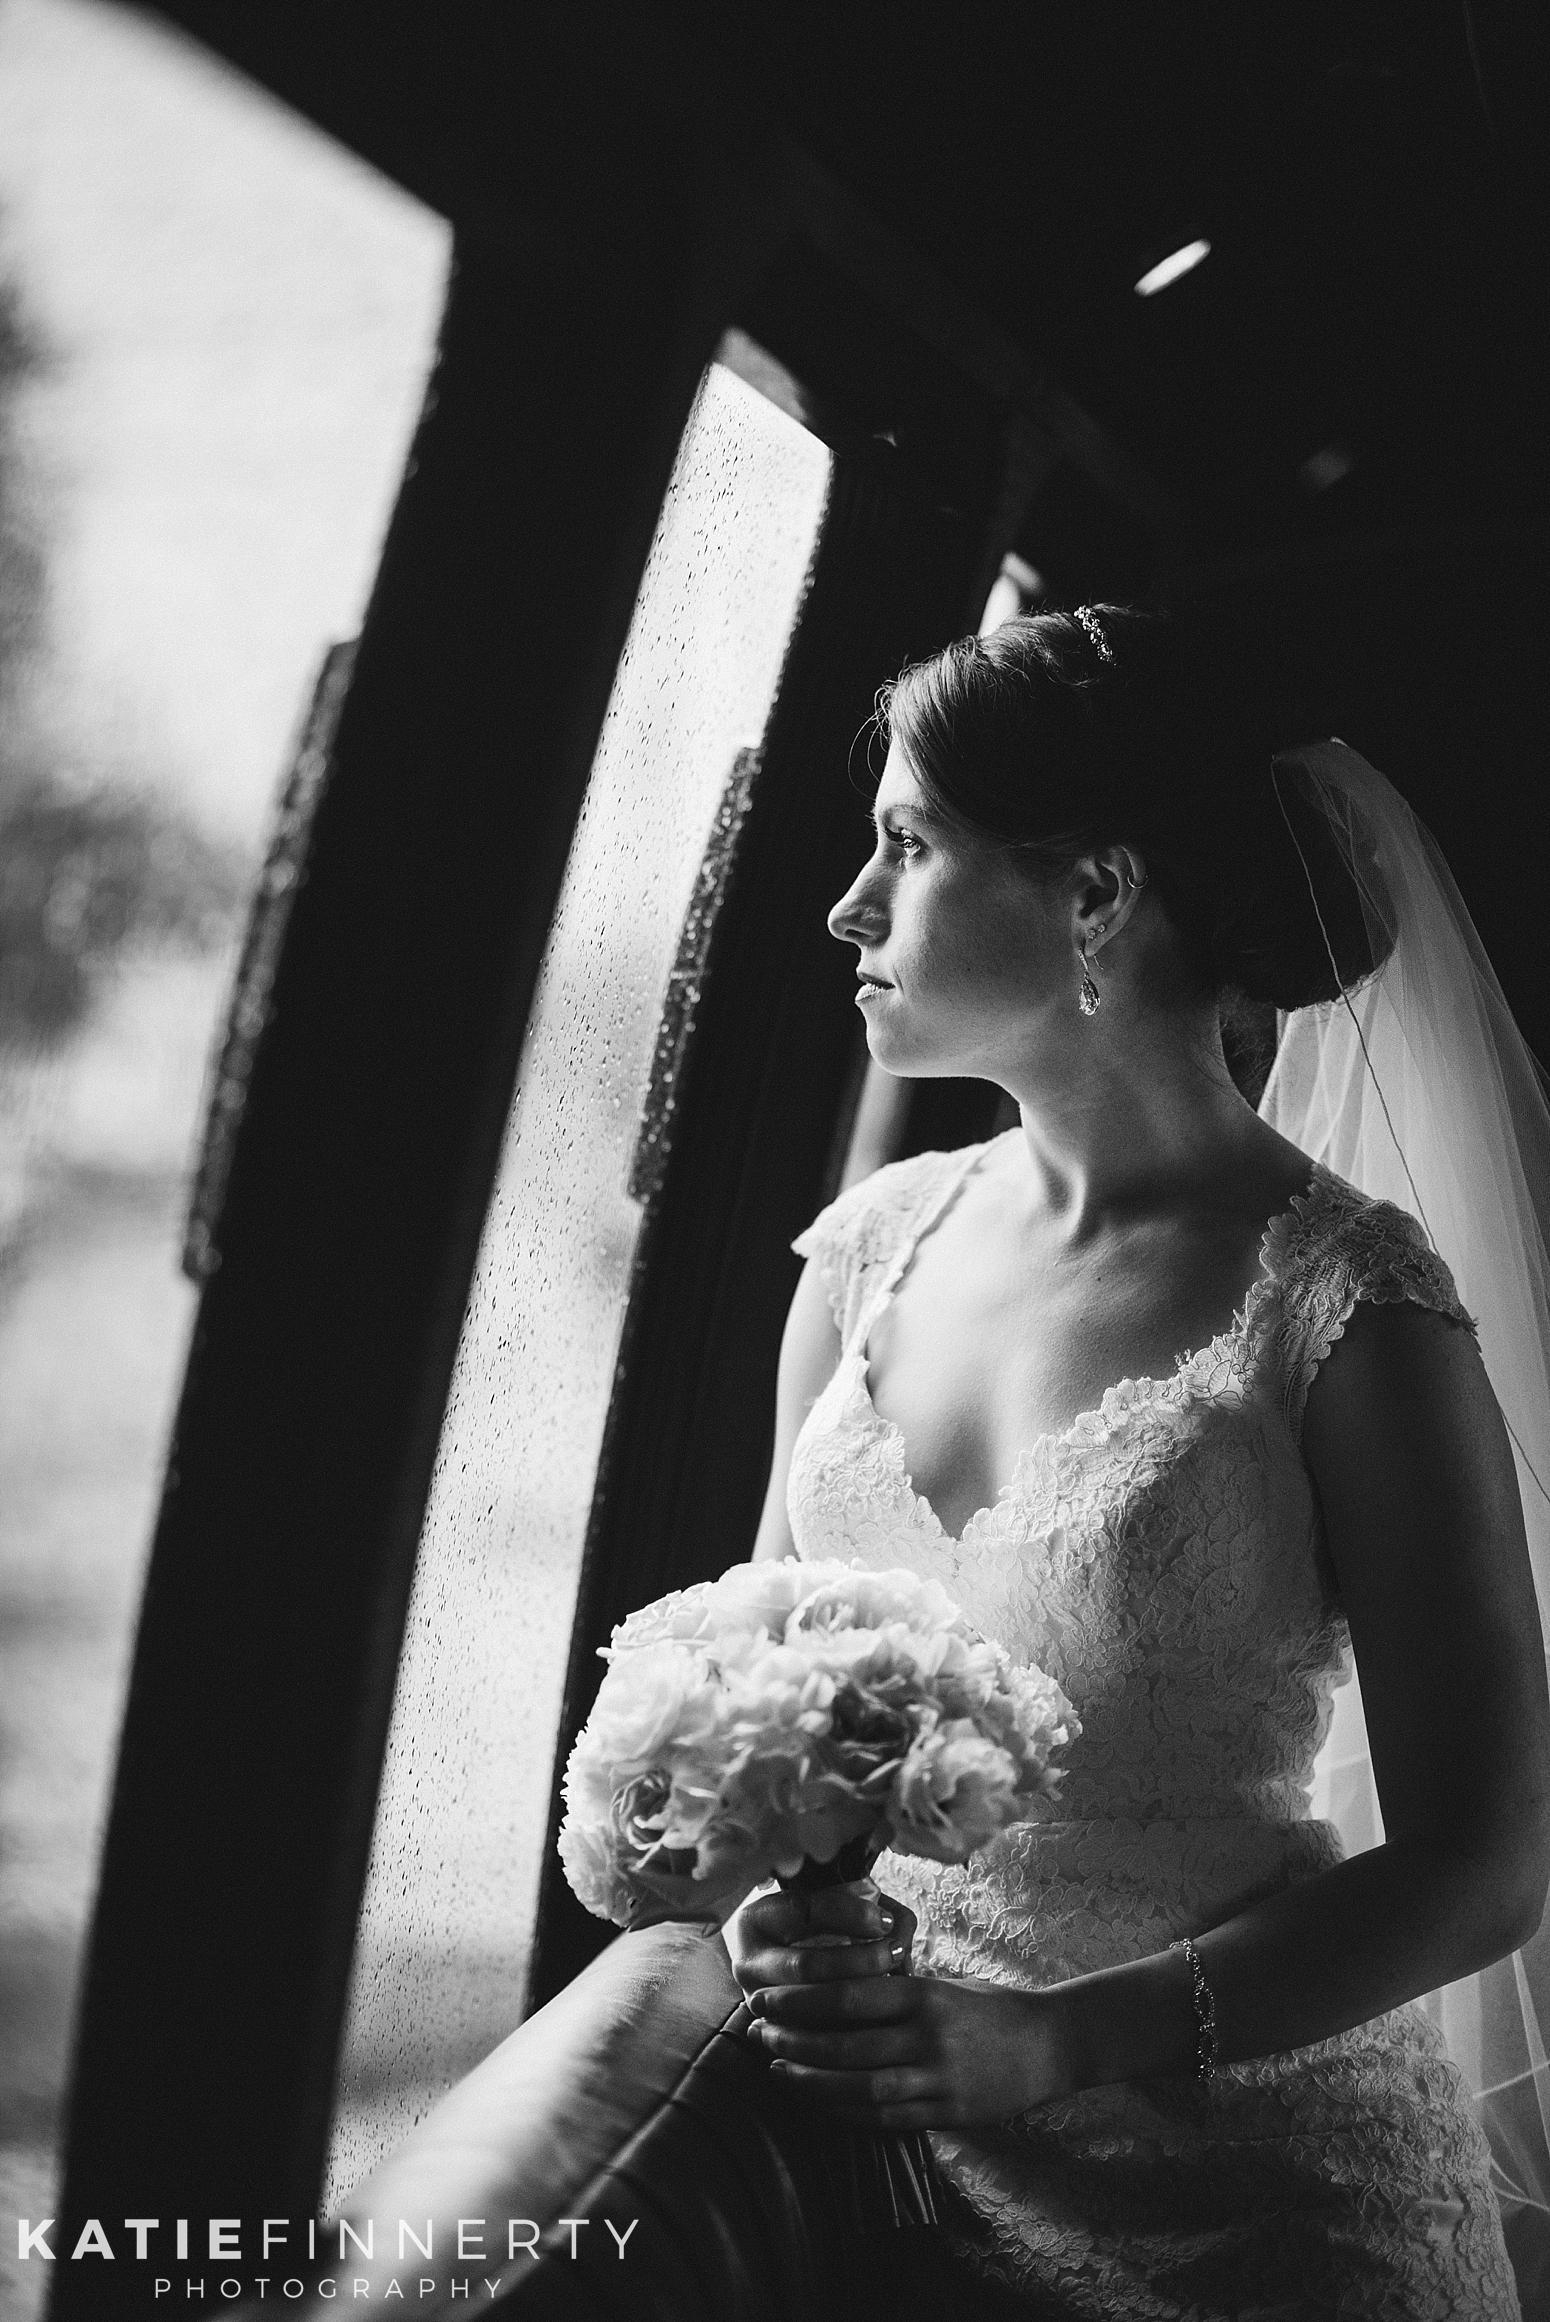 Belhurst Castle Rainy Day Wedding Photography